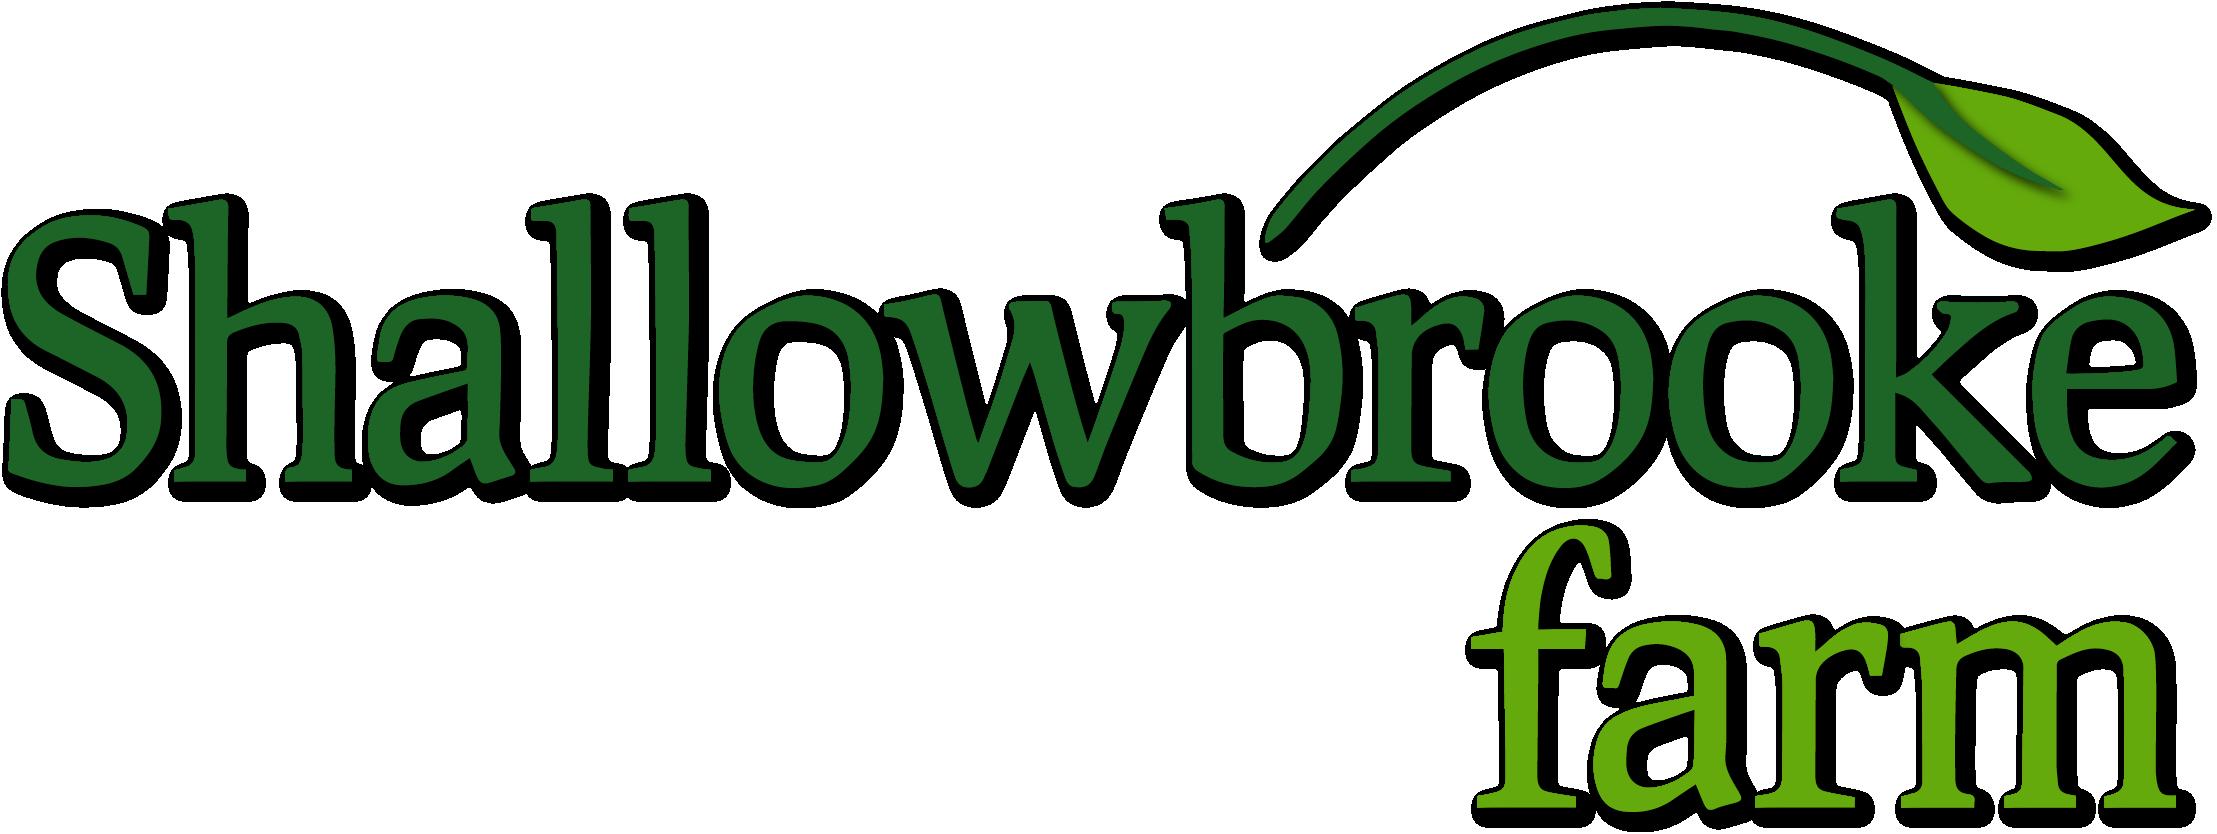 Shallowbrooke Farm